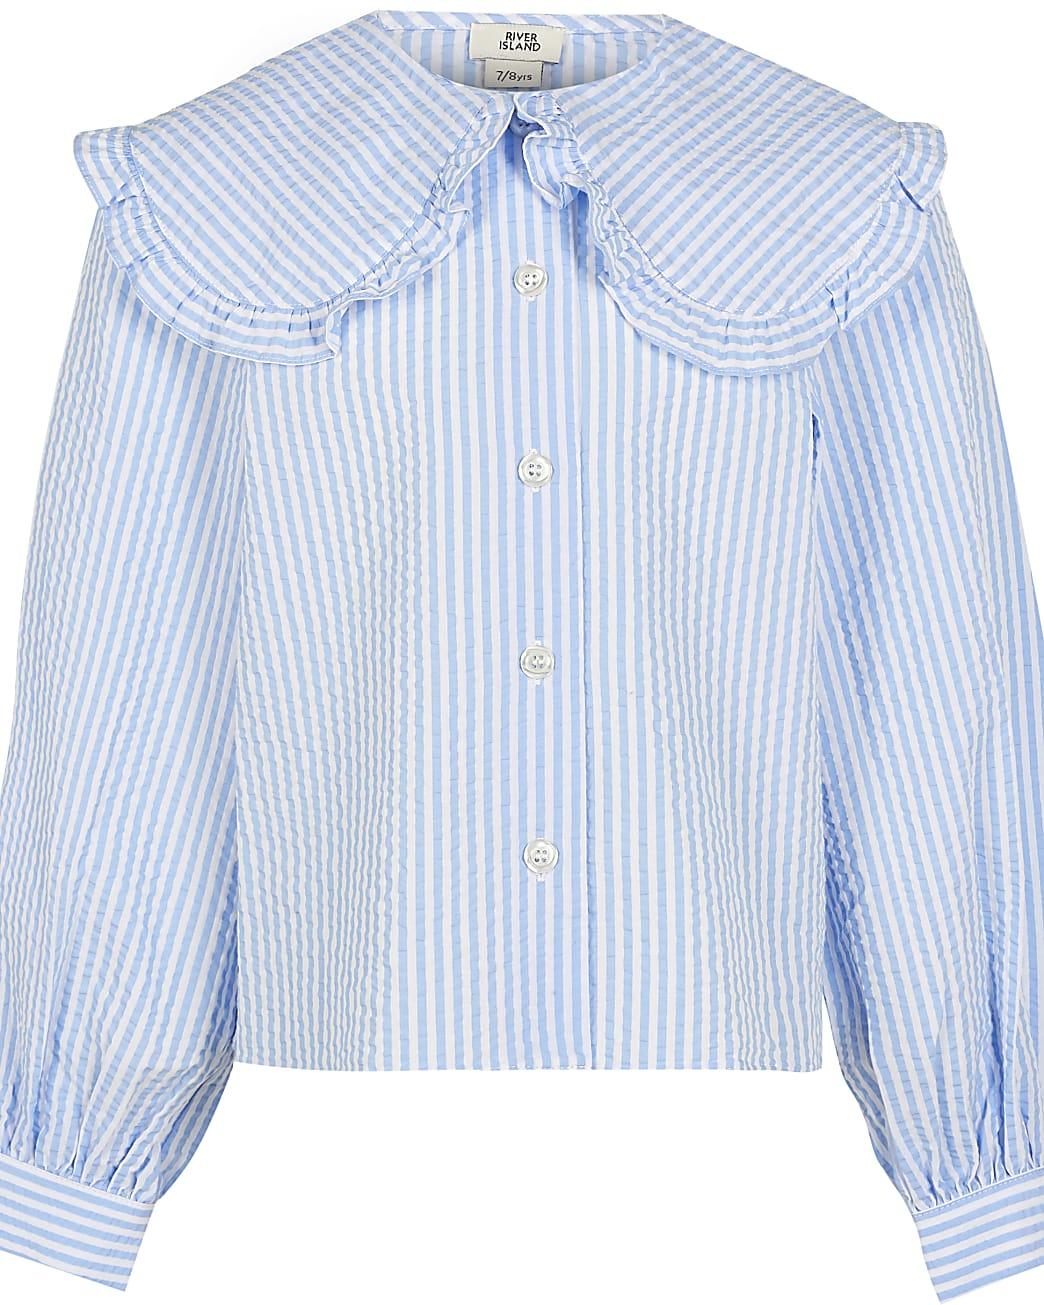 Age 13+ girls blue stripe shirt